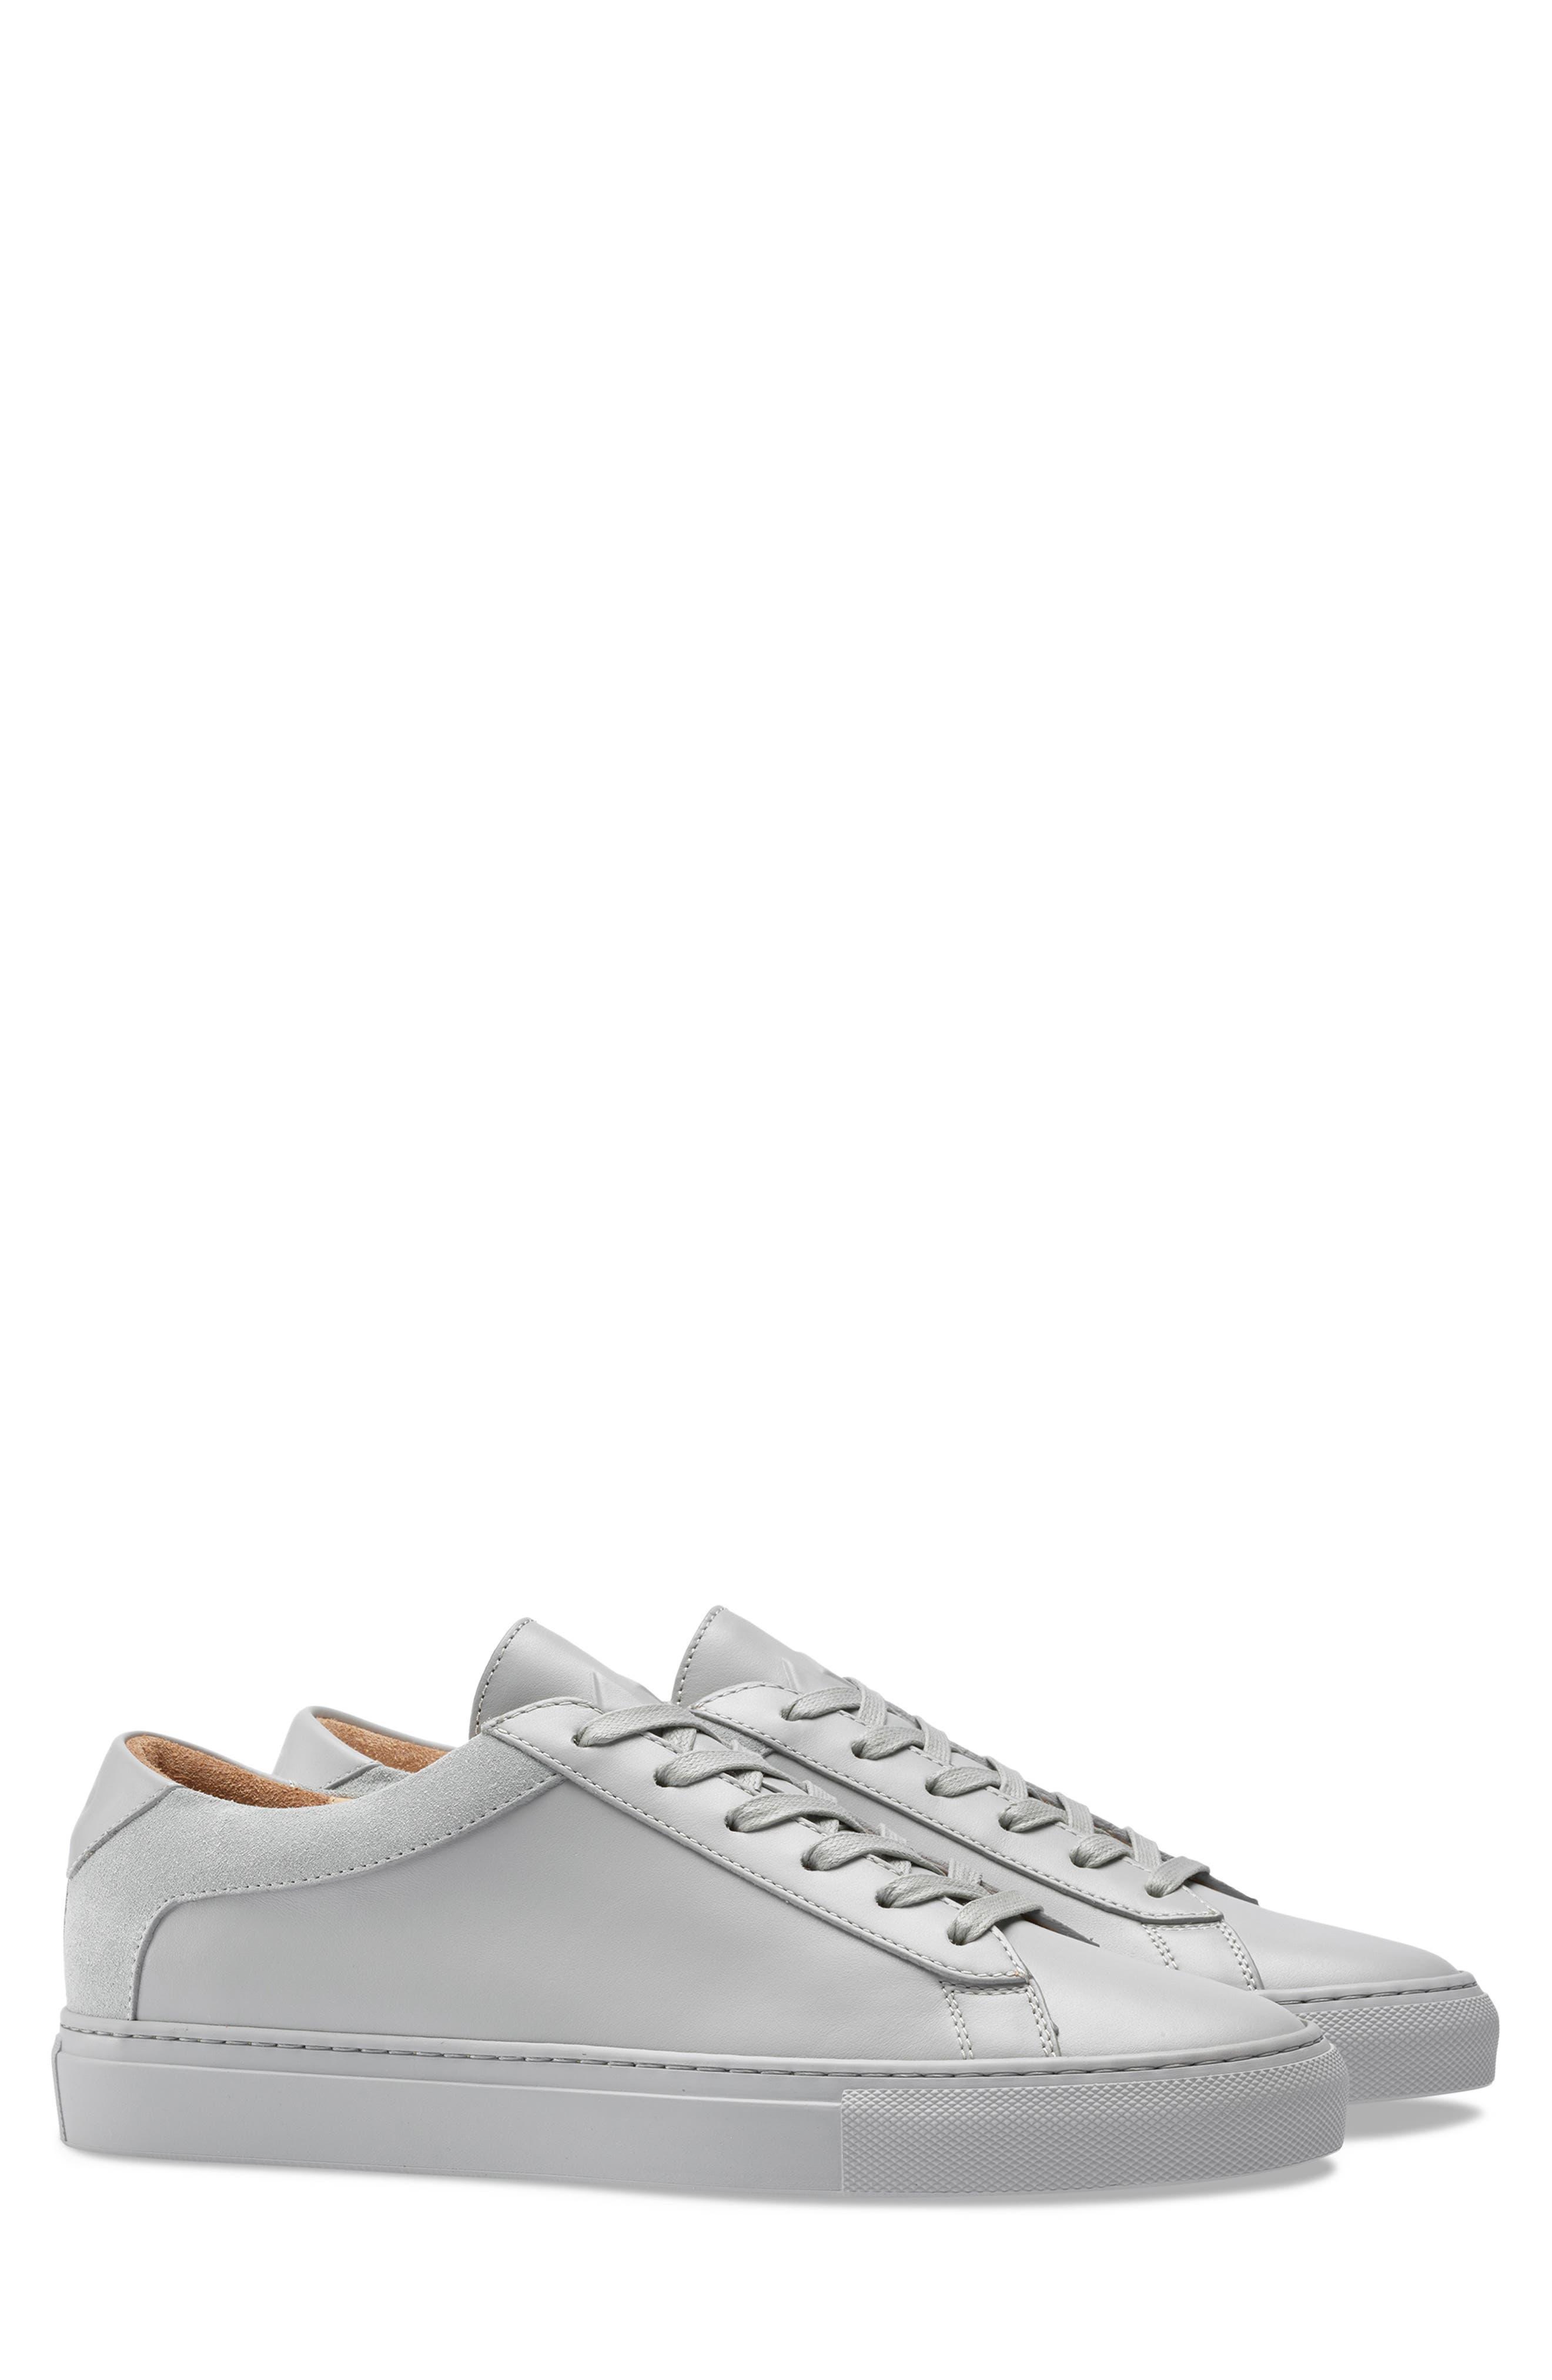 Men's KOIO Shoes   Nordstrom